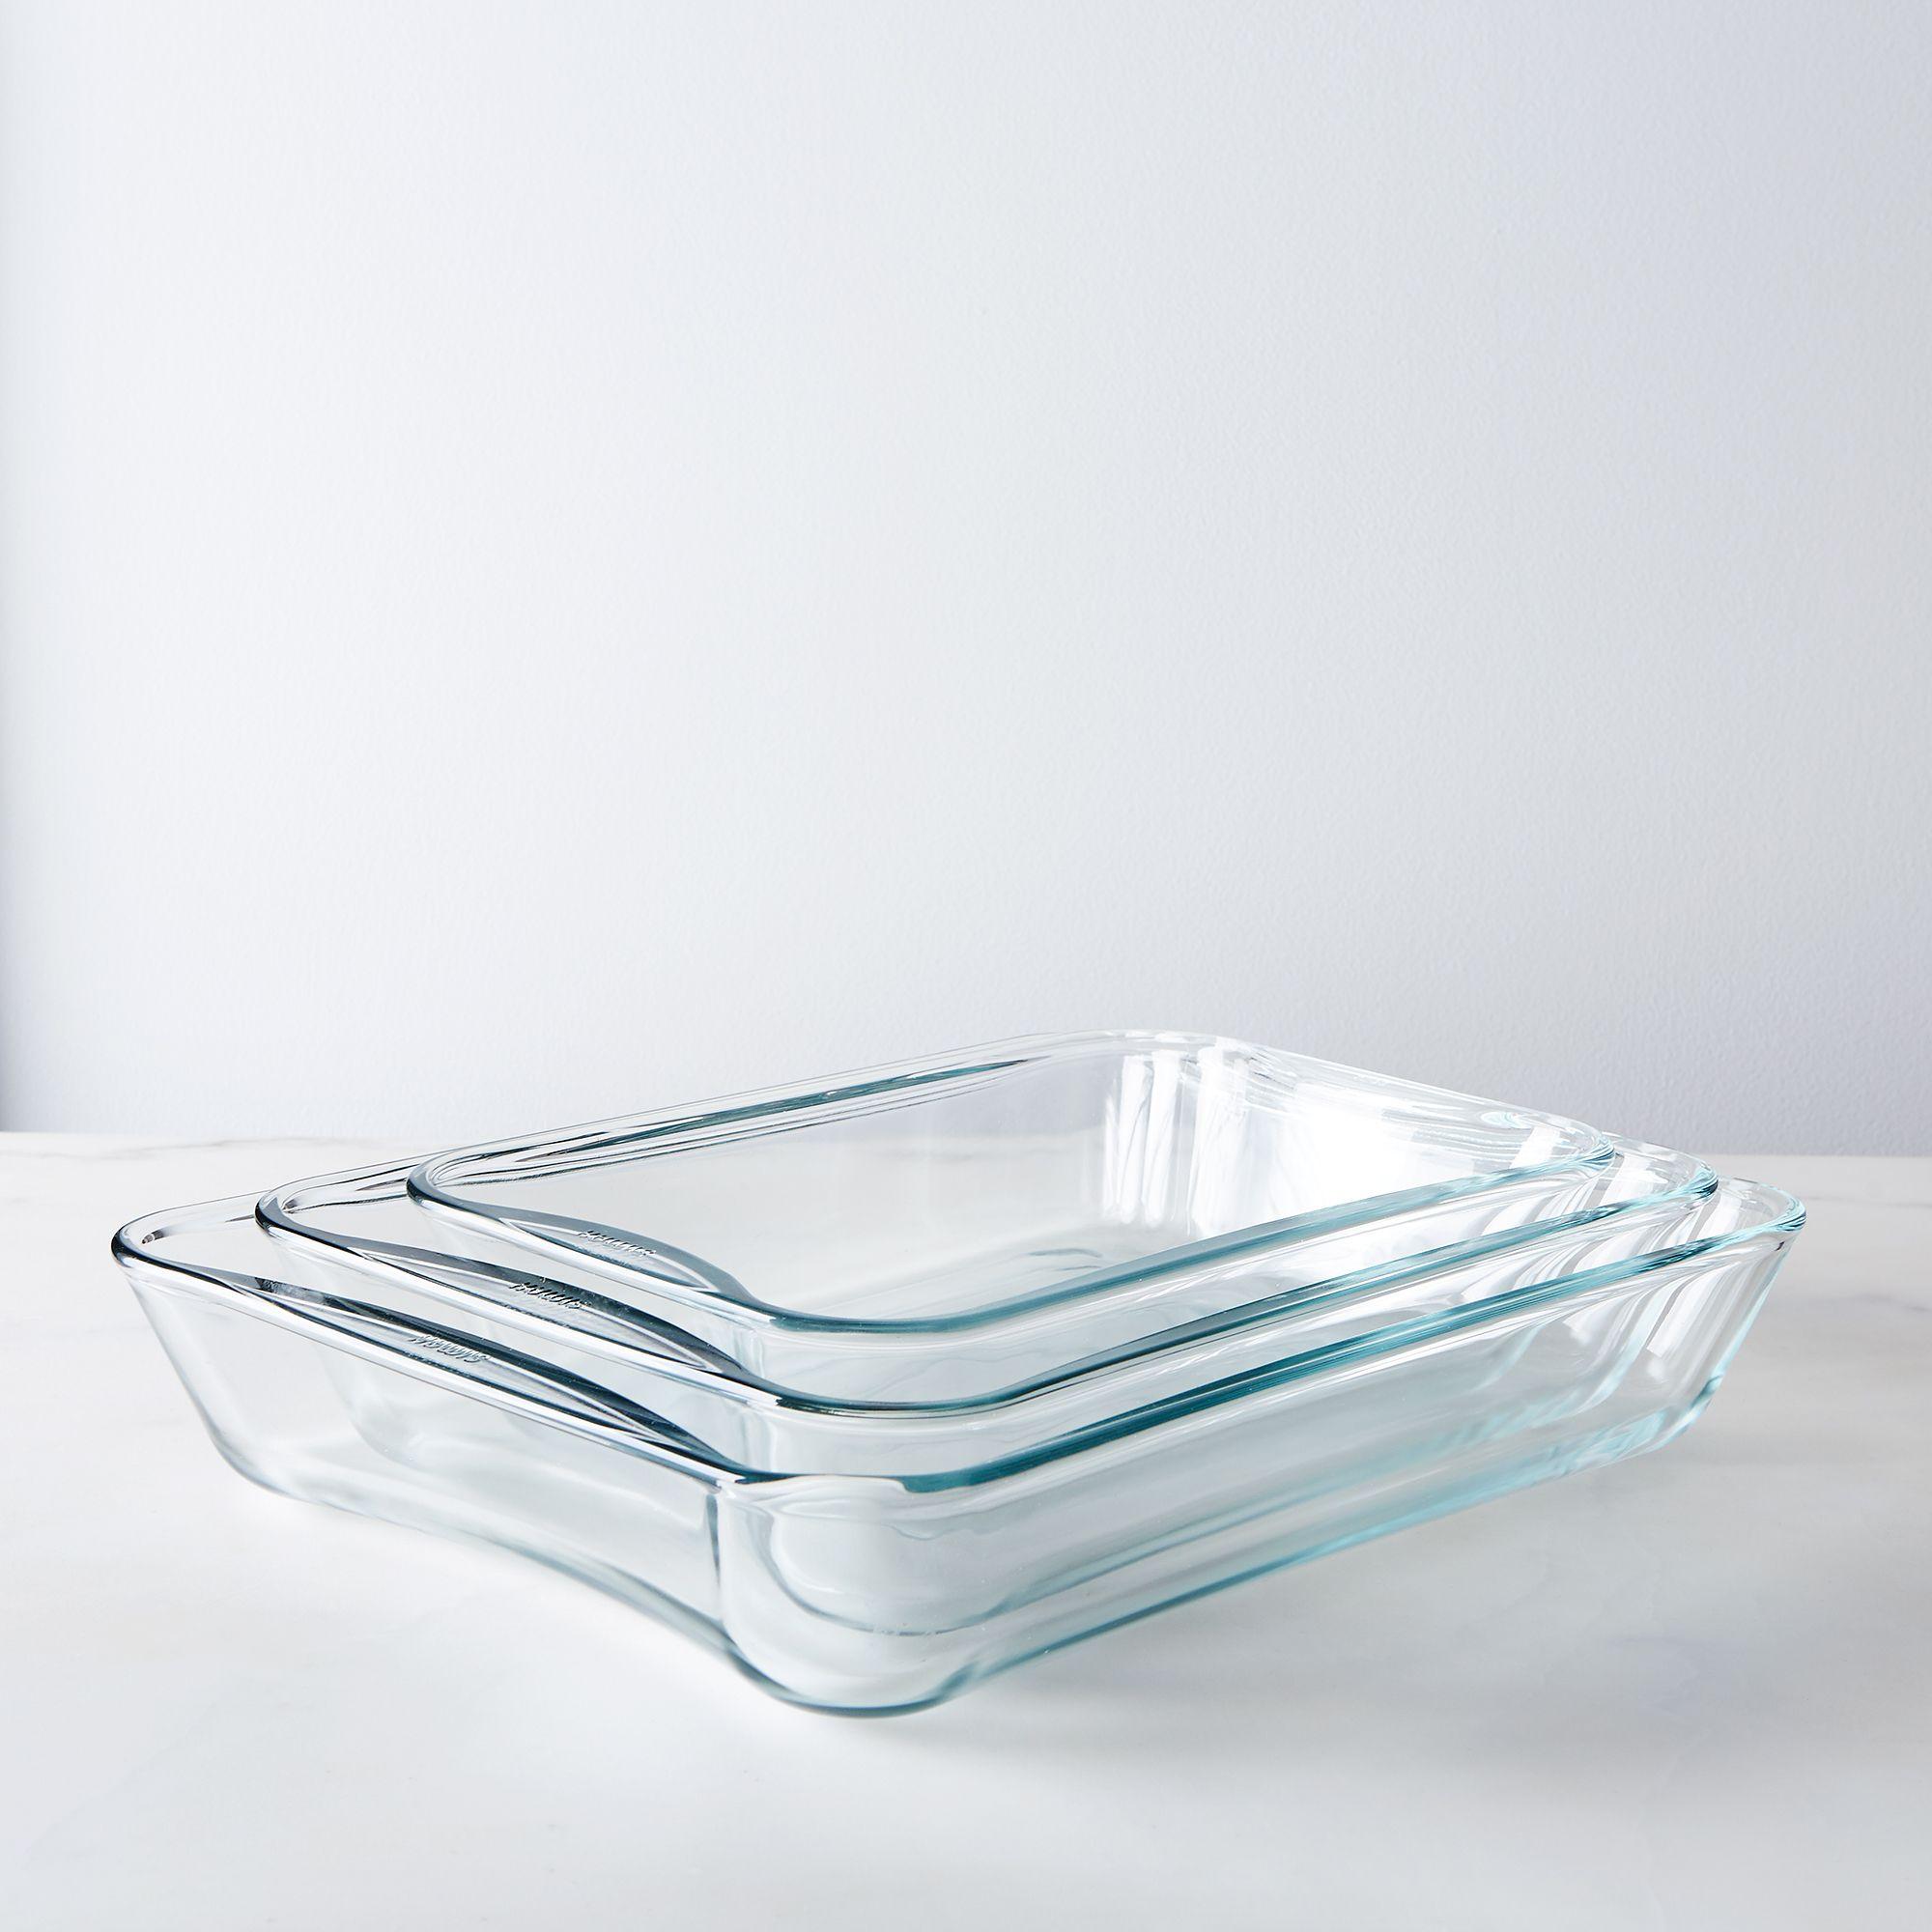 Ba5f93ca 8058 4092 a182 d8ea6ea06b63  2015 0528 simax borosilicate glass 3 piece roasting pan set silo bobbi lin 0243